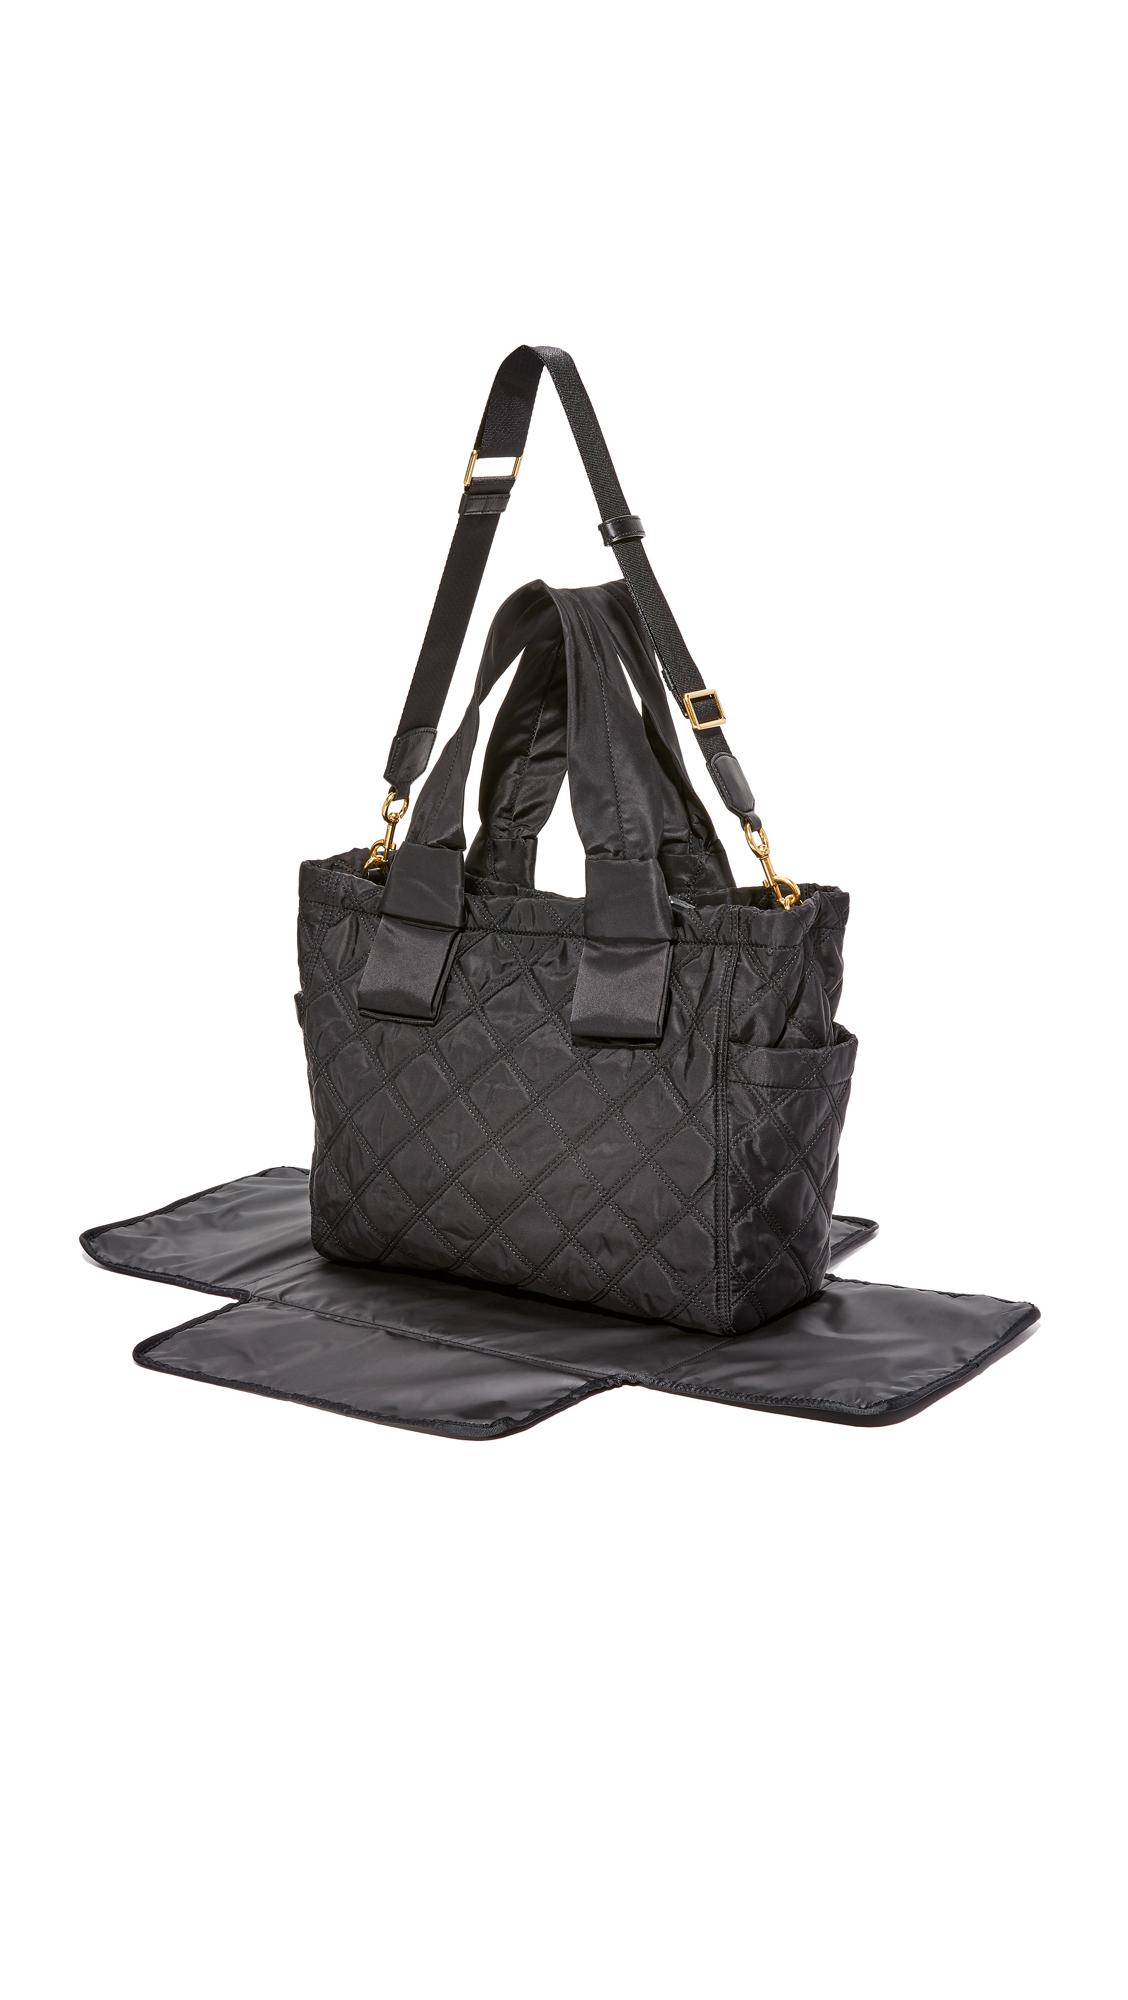 0f5acbf9ee07 Marc Jacobs Nylon Knot Baby Bag